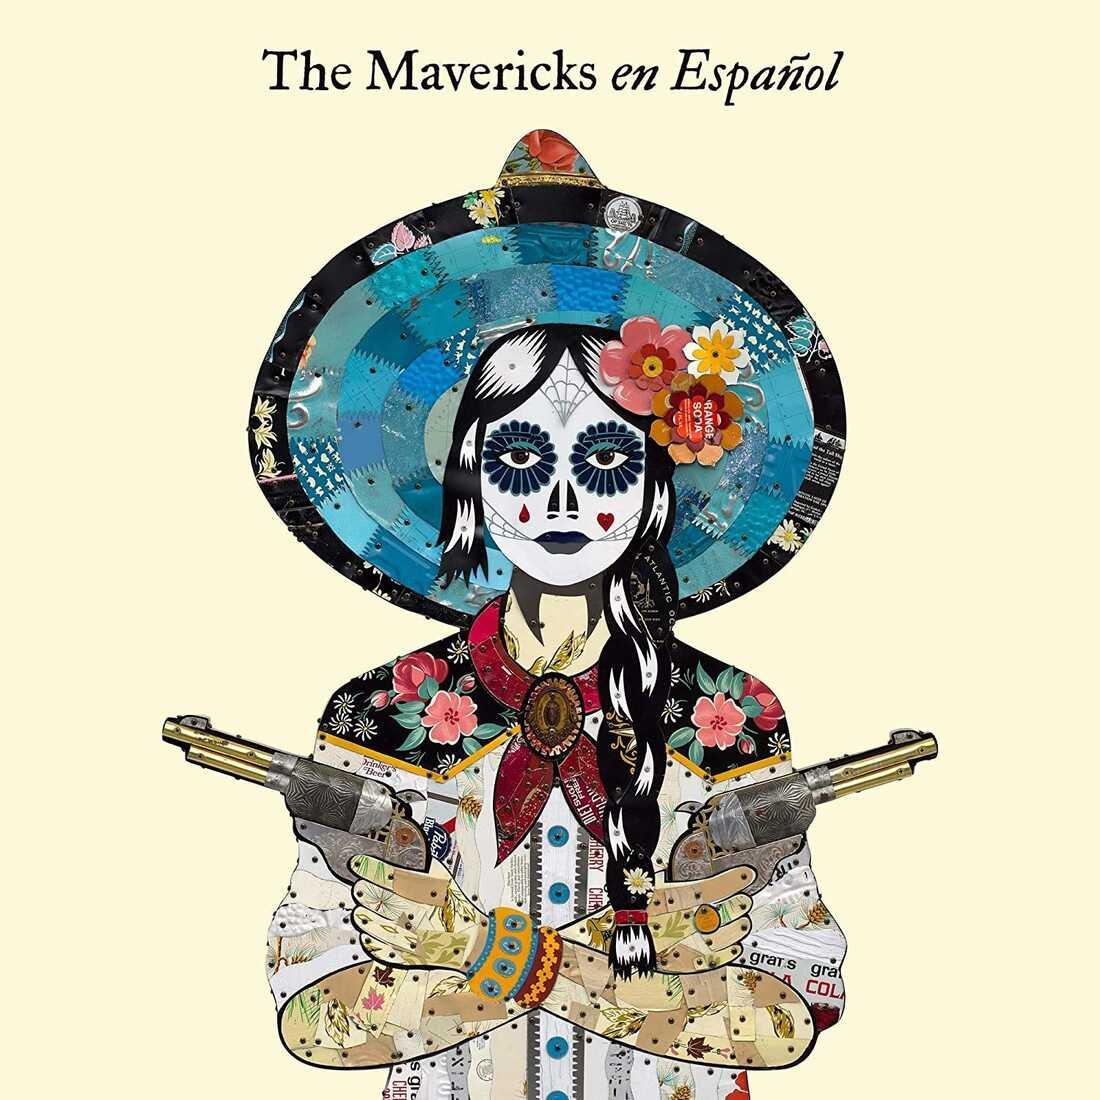 The Mavericks, En Espanol